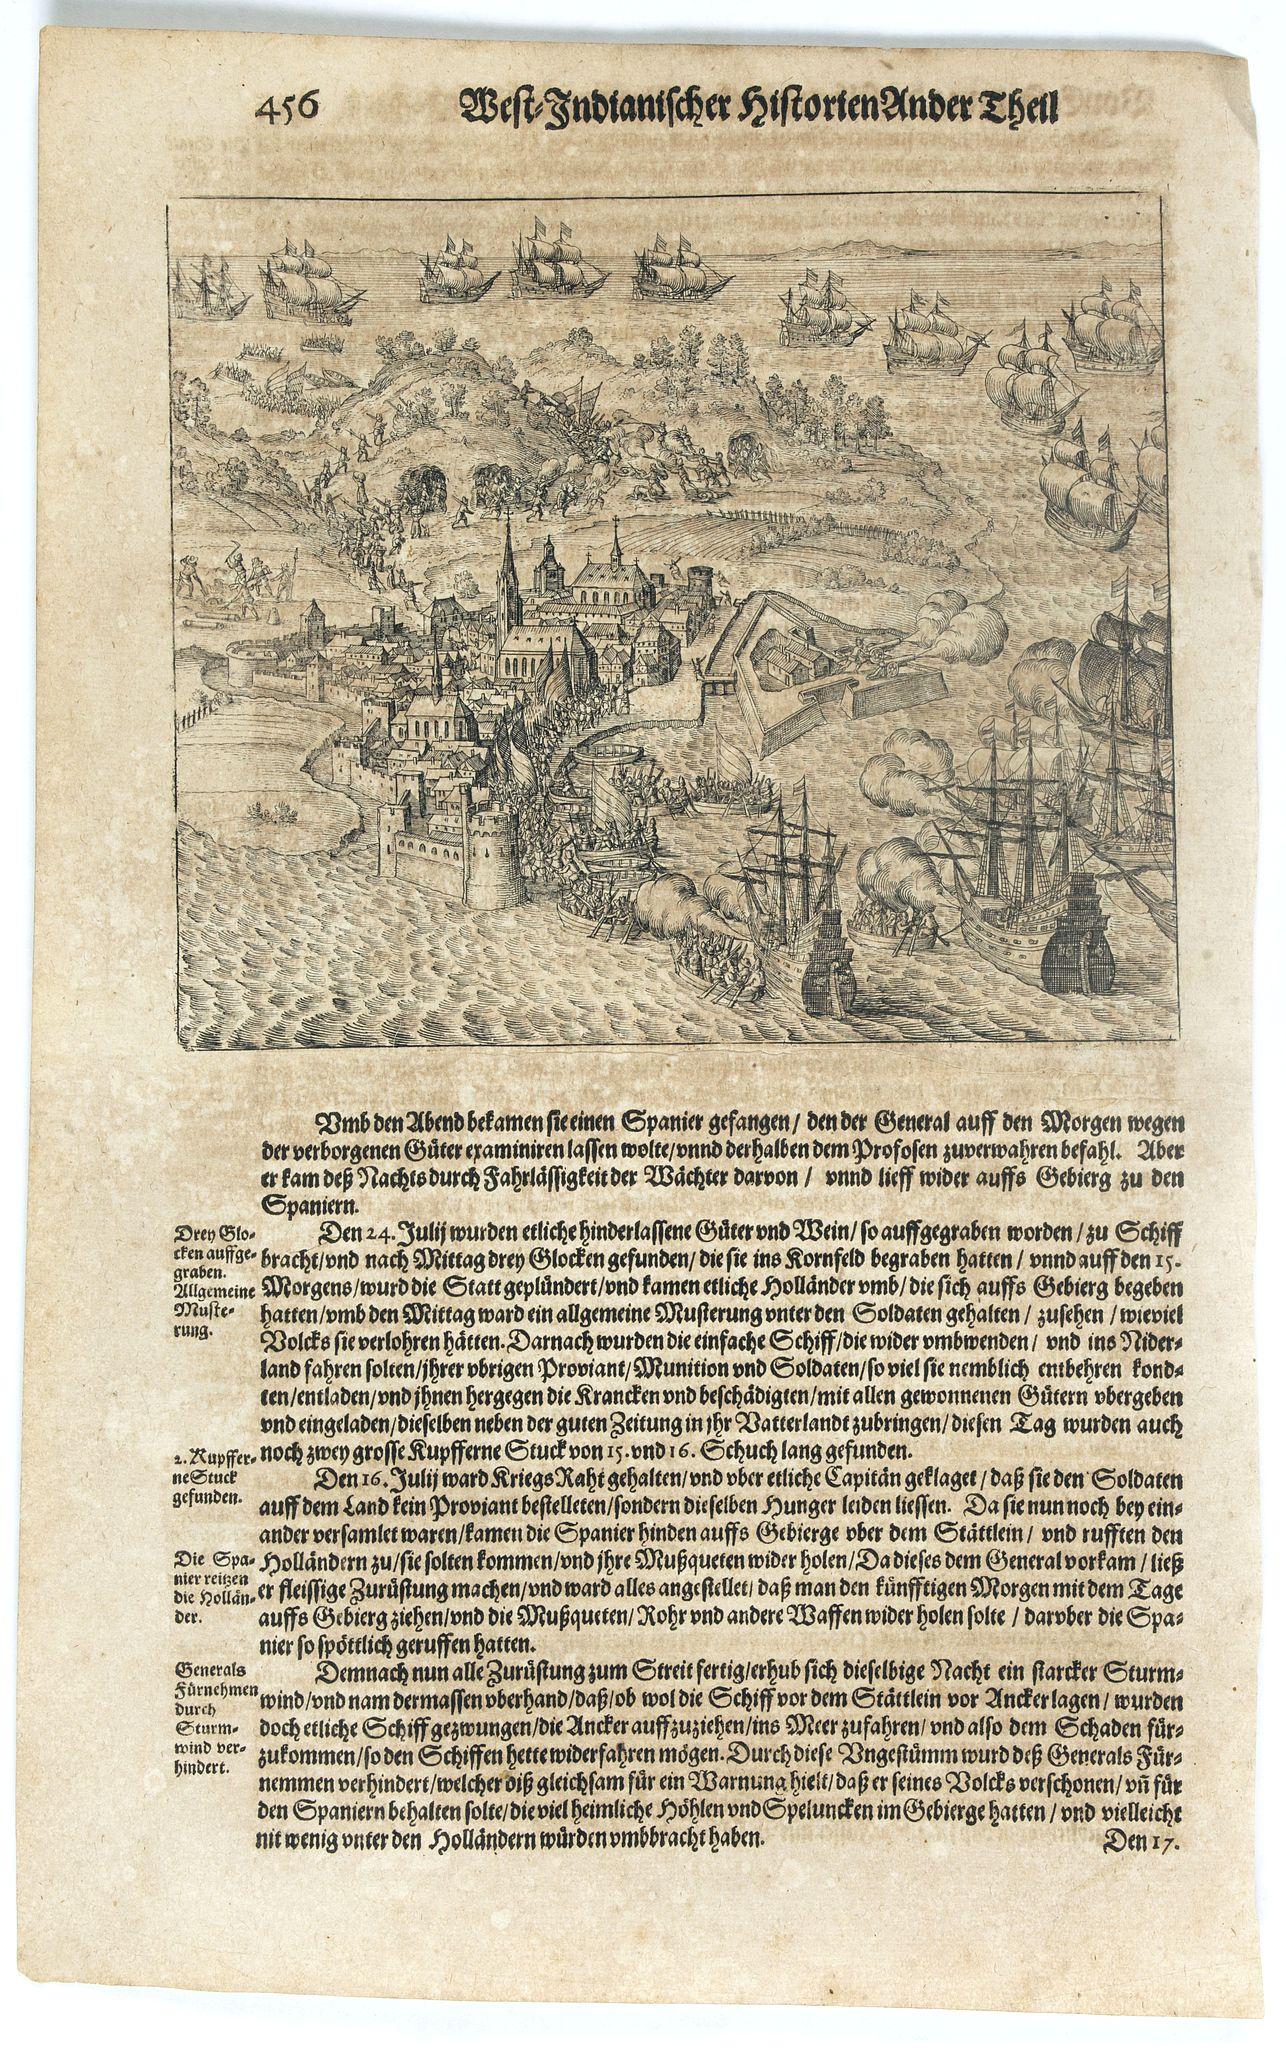 GOTTFRIED, J.L. / DE BRY, T. -  [Attack of Dutch fleet commanded by Pieter van der Does of Gran Canaria in 1599].